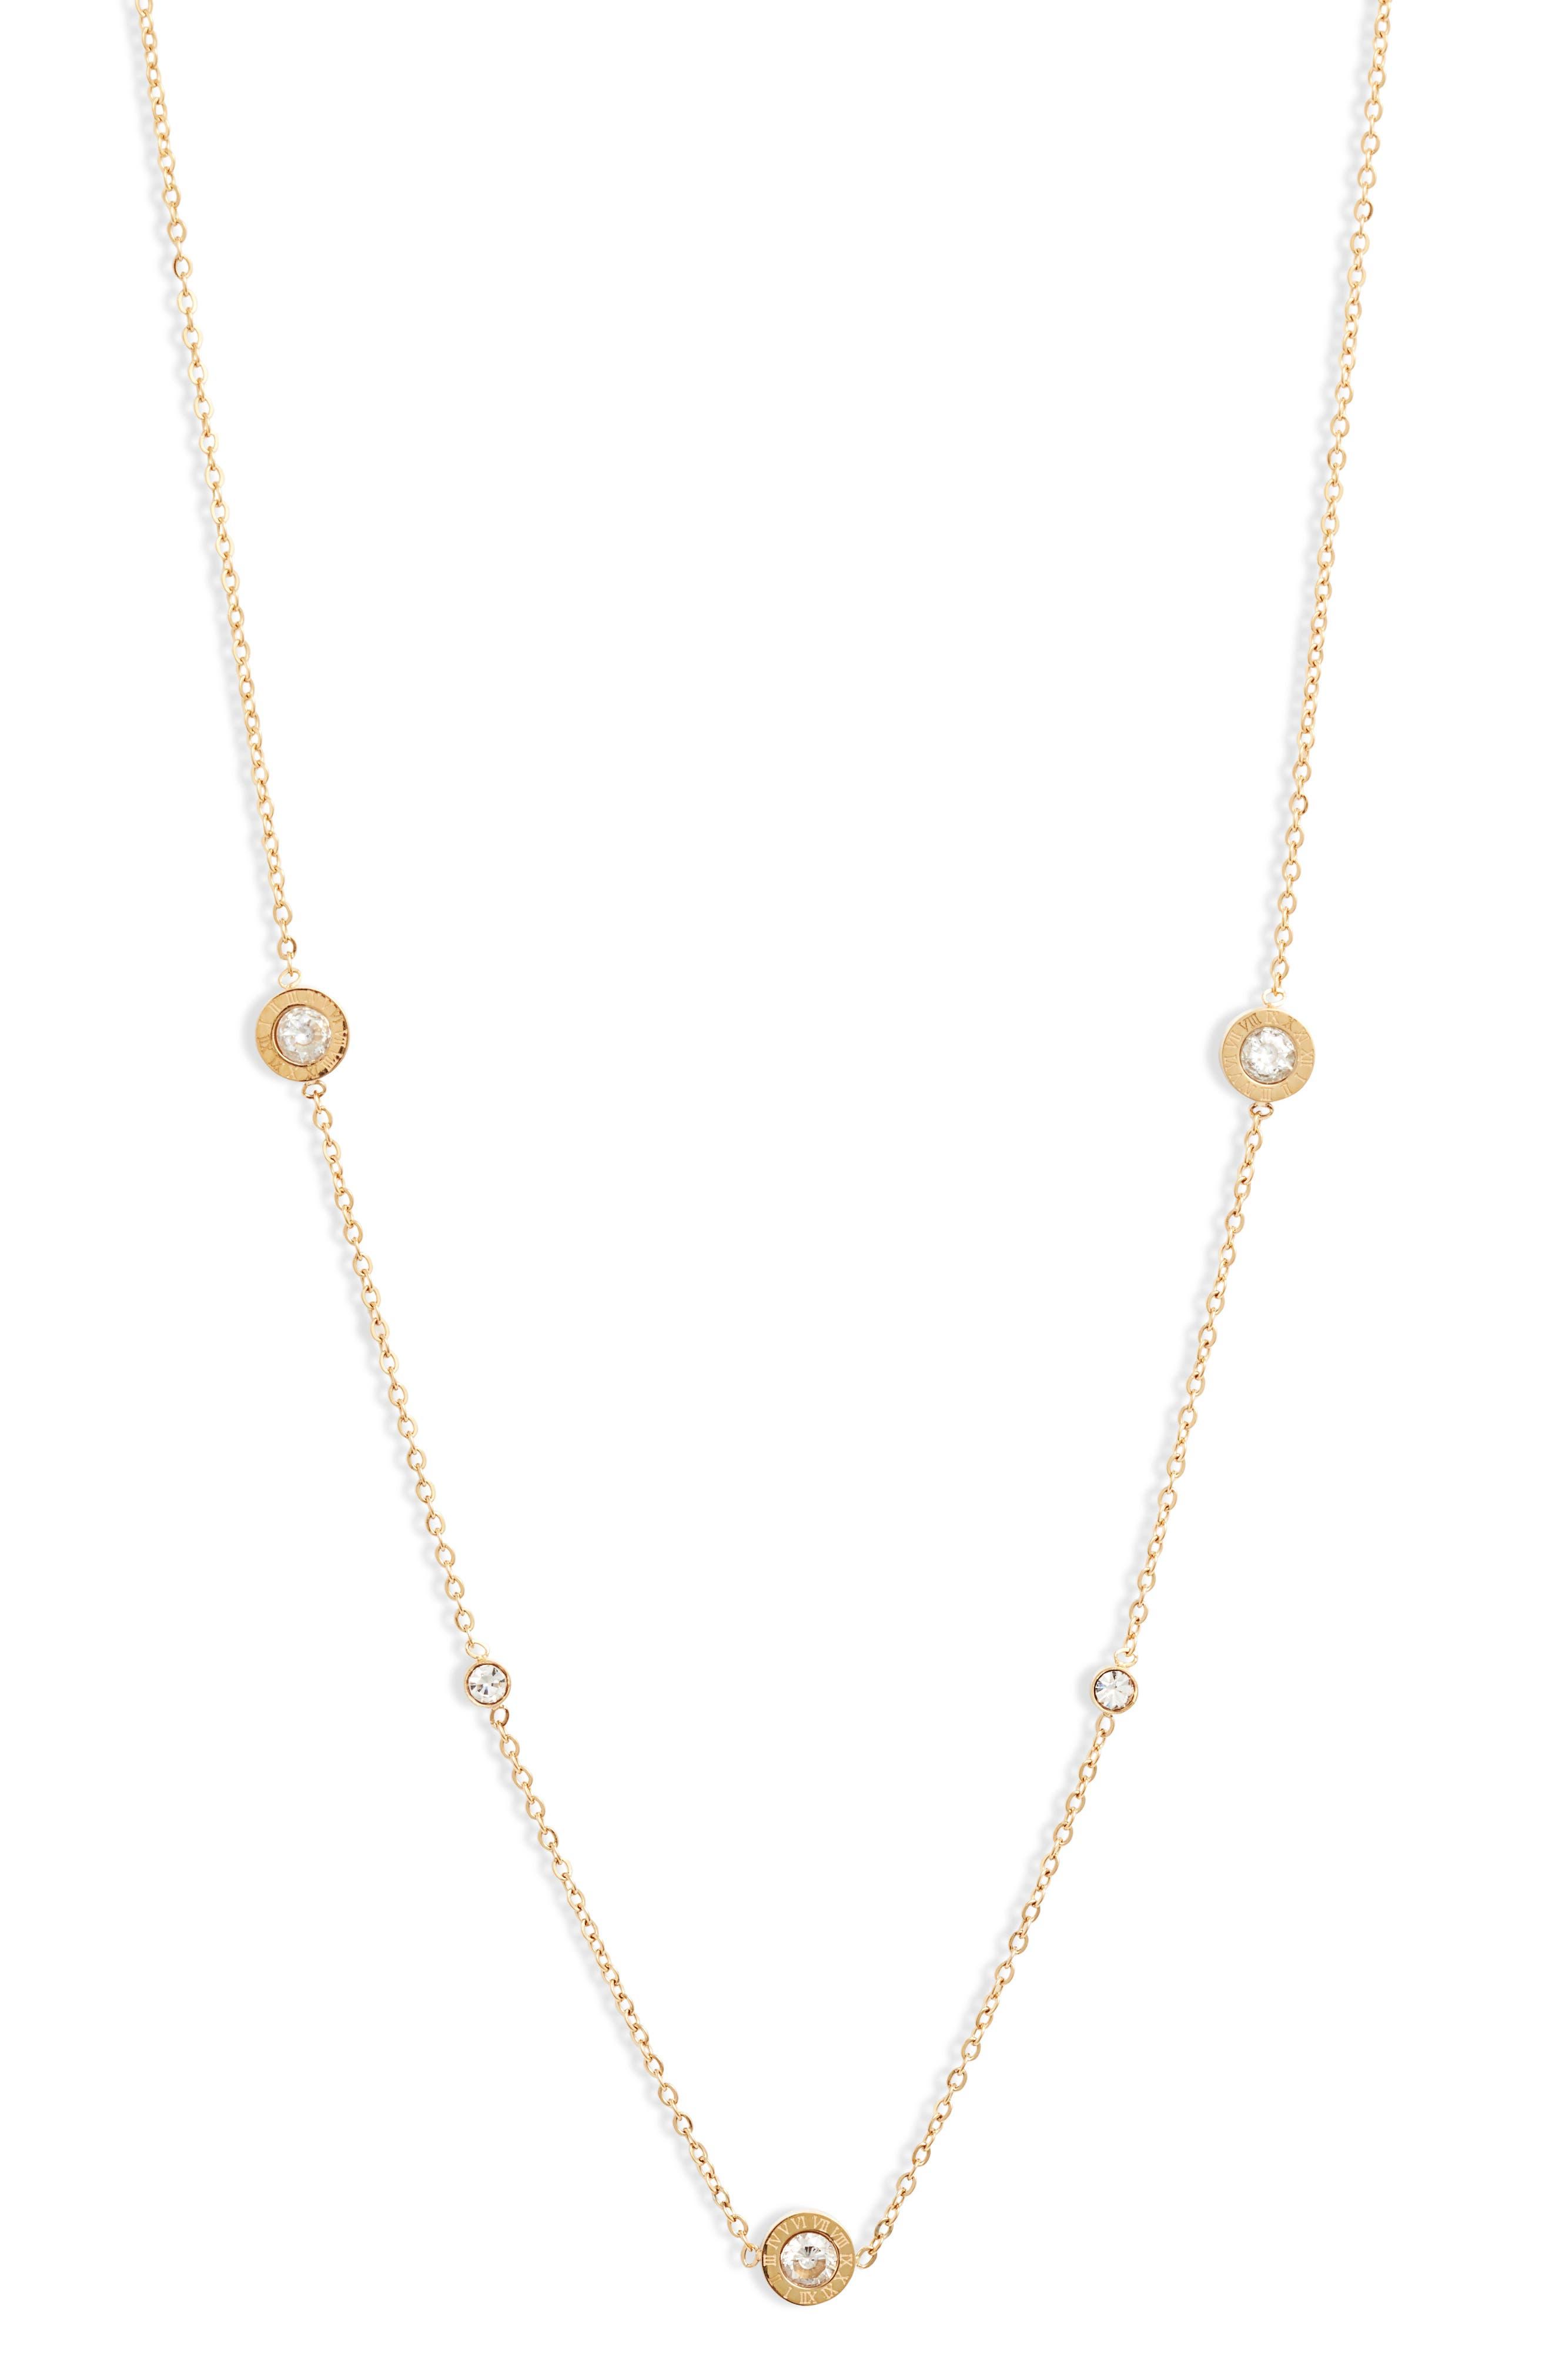 Roman Numeral Charm Necklace